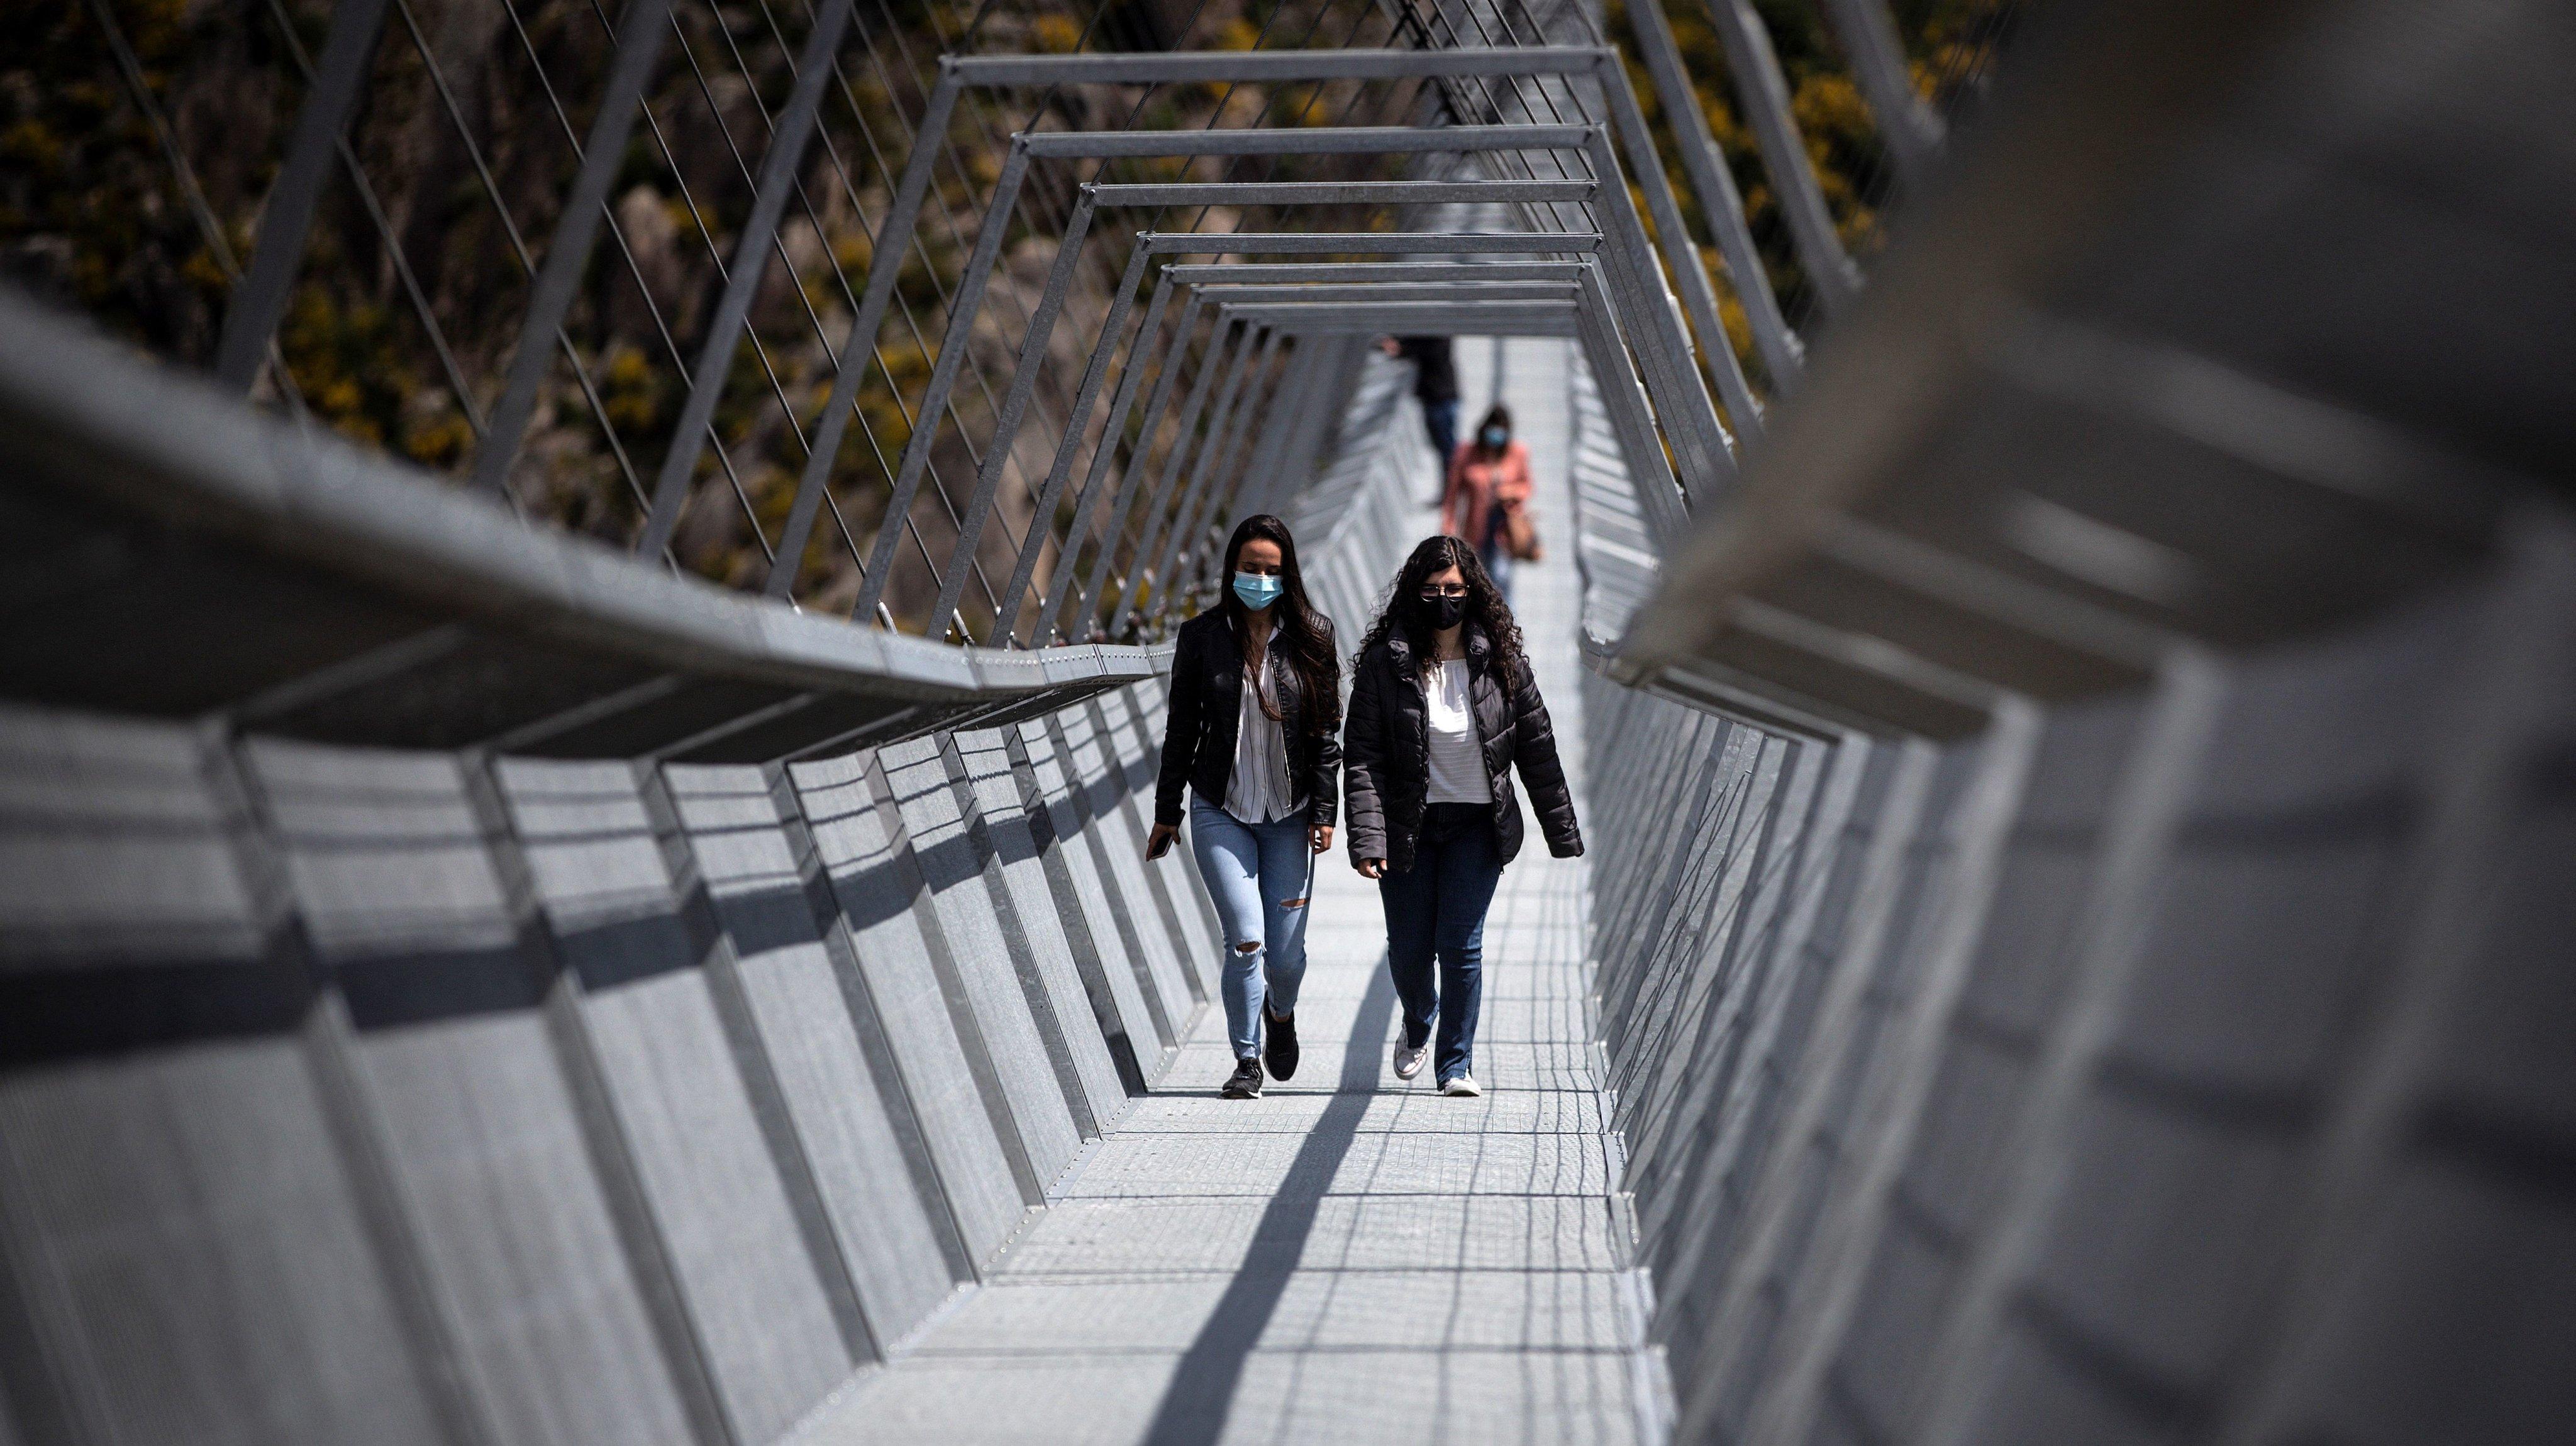 PORTUGAL-INFRASTRUCTURE-TOURISM-BRIDGE